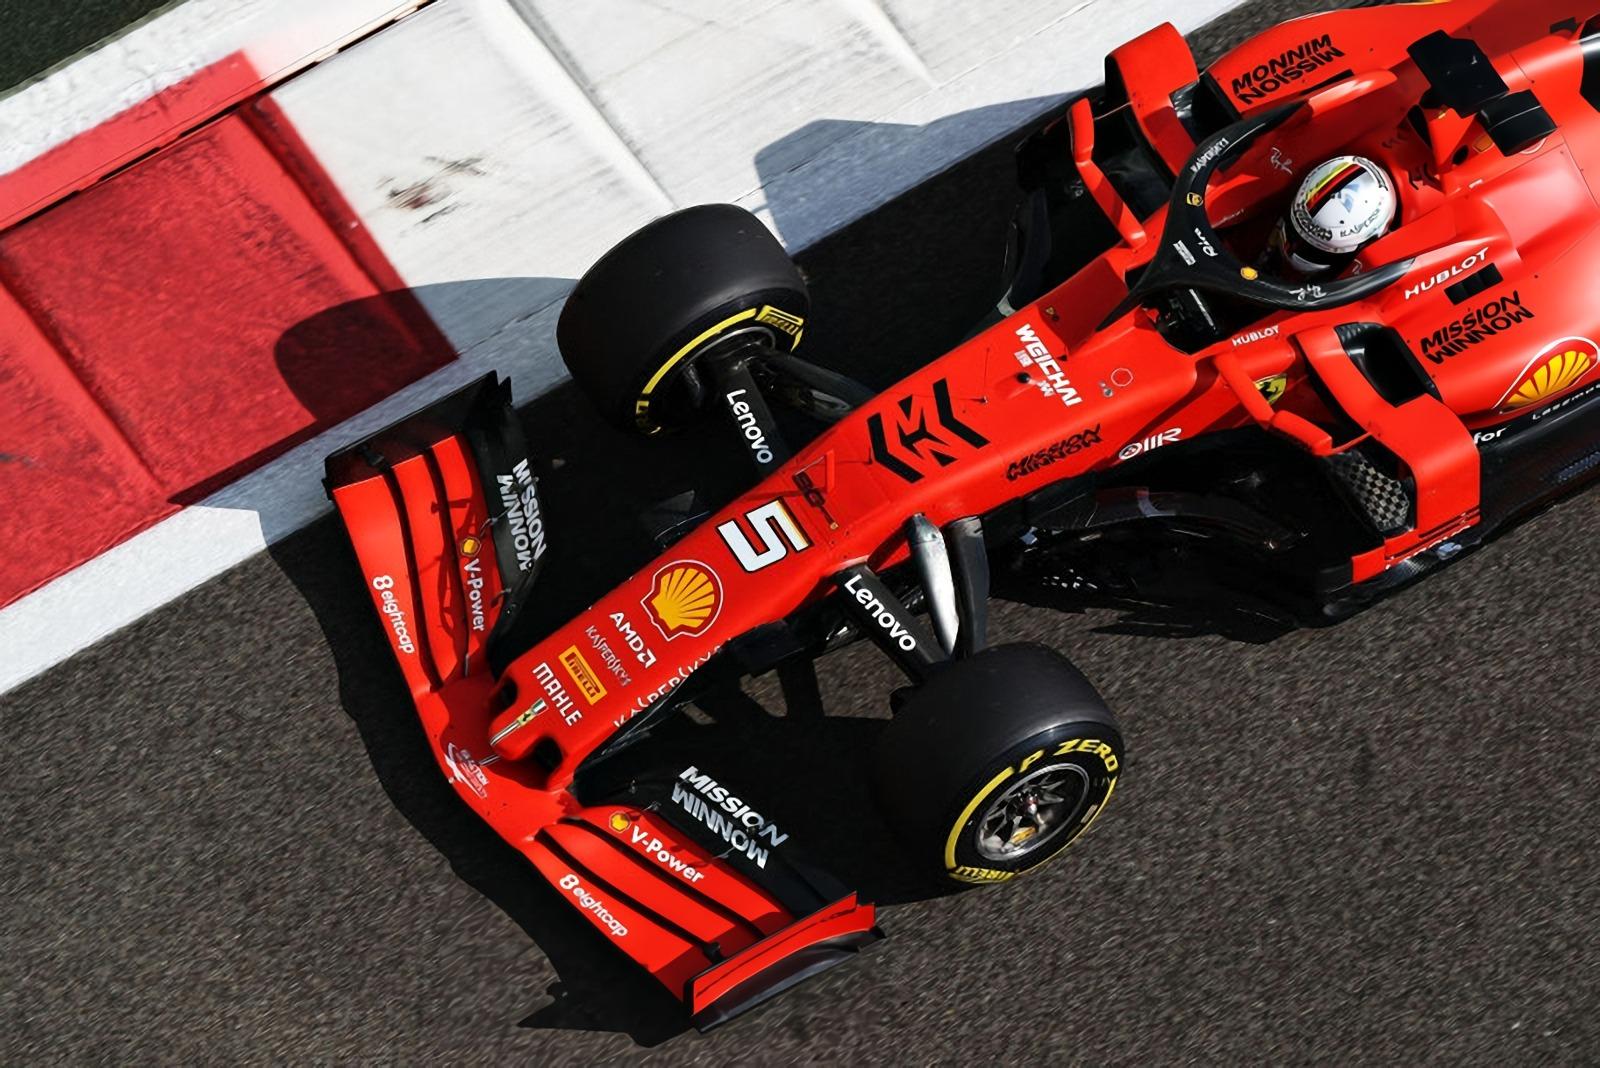 Ferrari SF90, a very efficient car and an exceptional engine